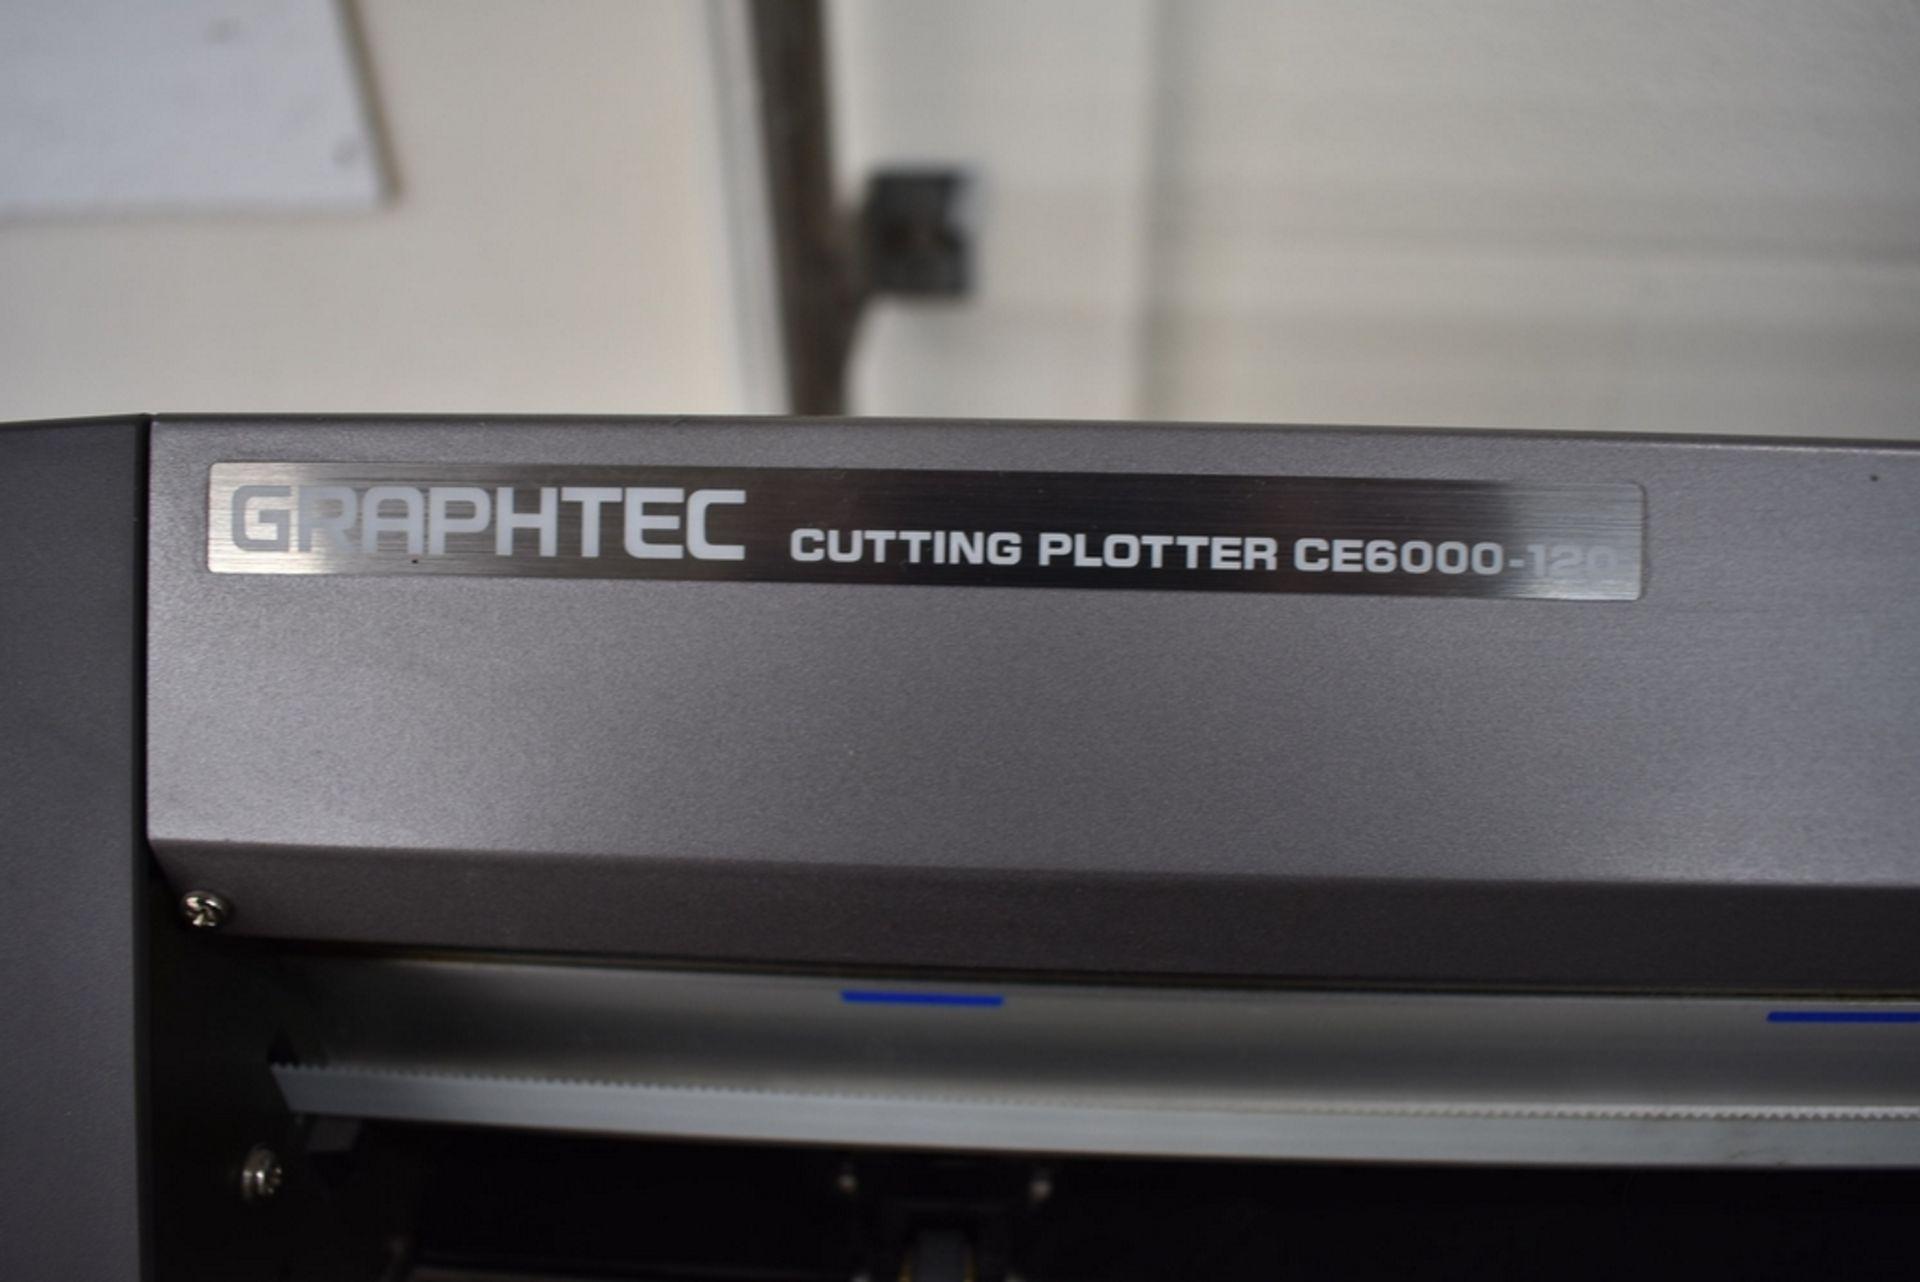 "GRAPHTEC MODEL CE6000-120 VINYL CUTTER 48"" CAPACITY - Image 3 of 4"